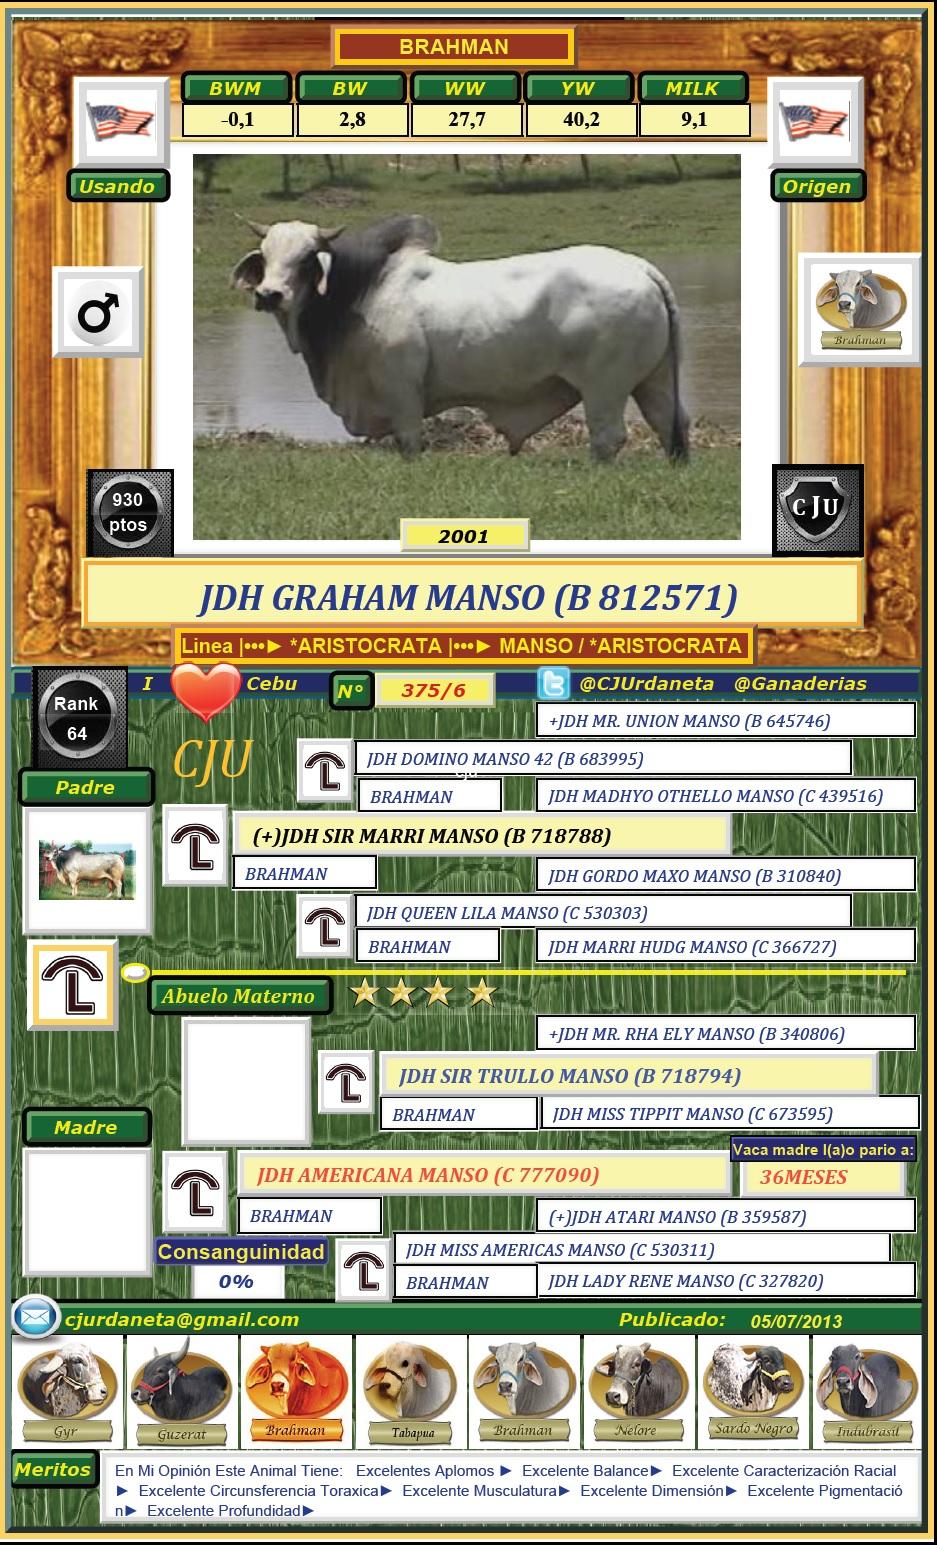 JDH GRAHAM MANSO (B 812571)